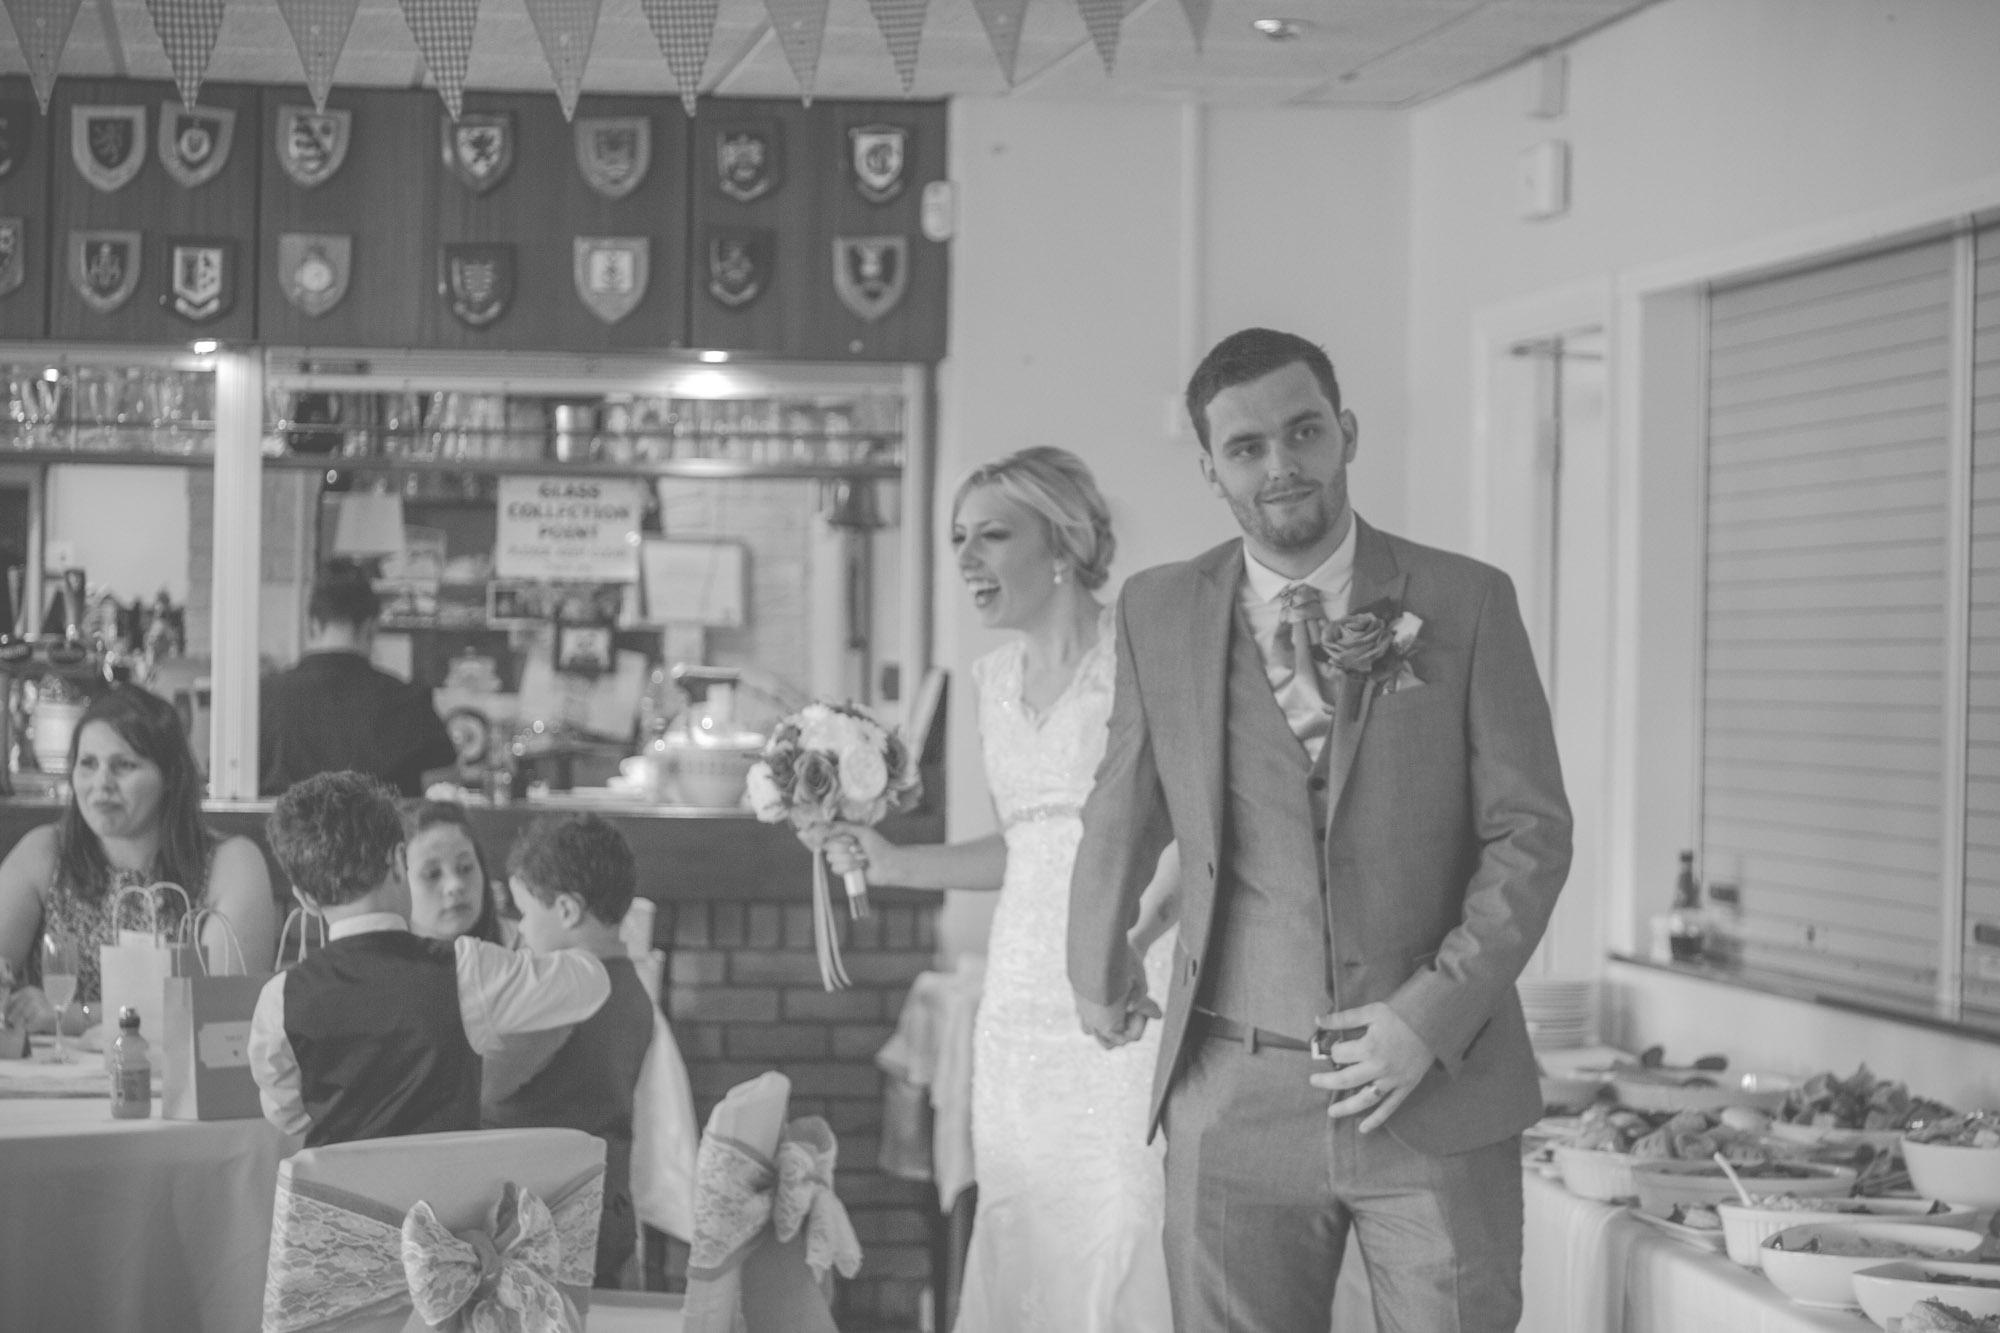 skipton-registry-office-wedding-photography-43.jpg